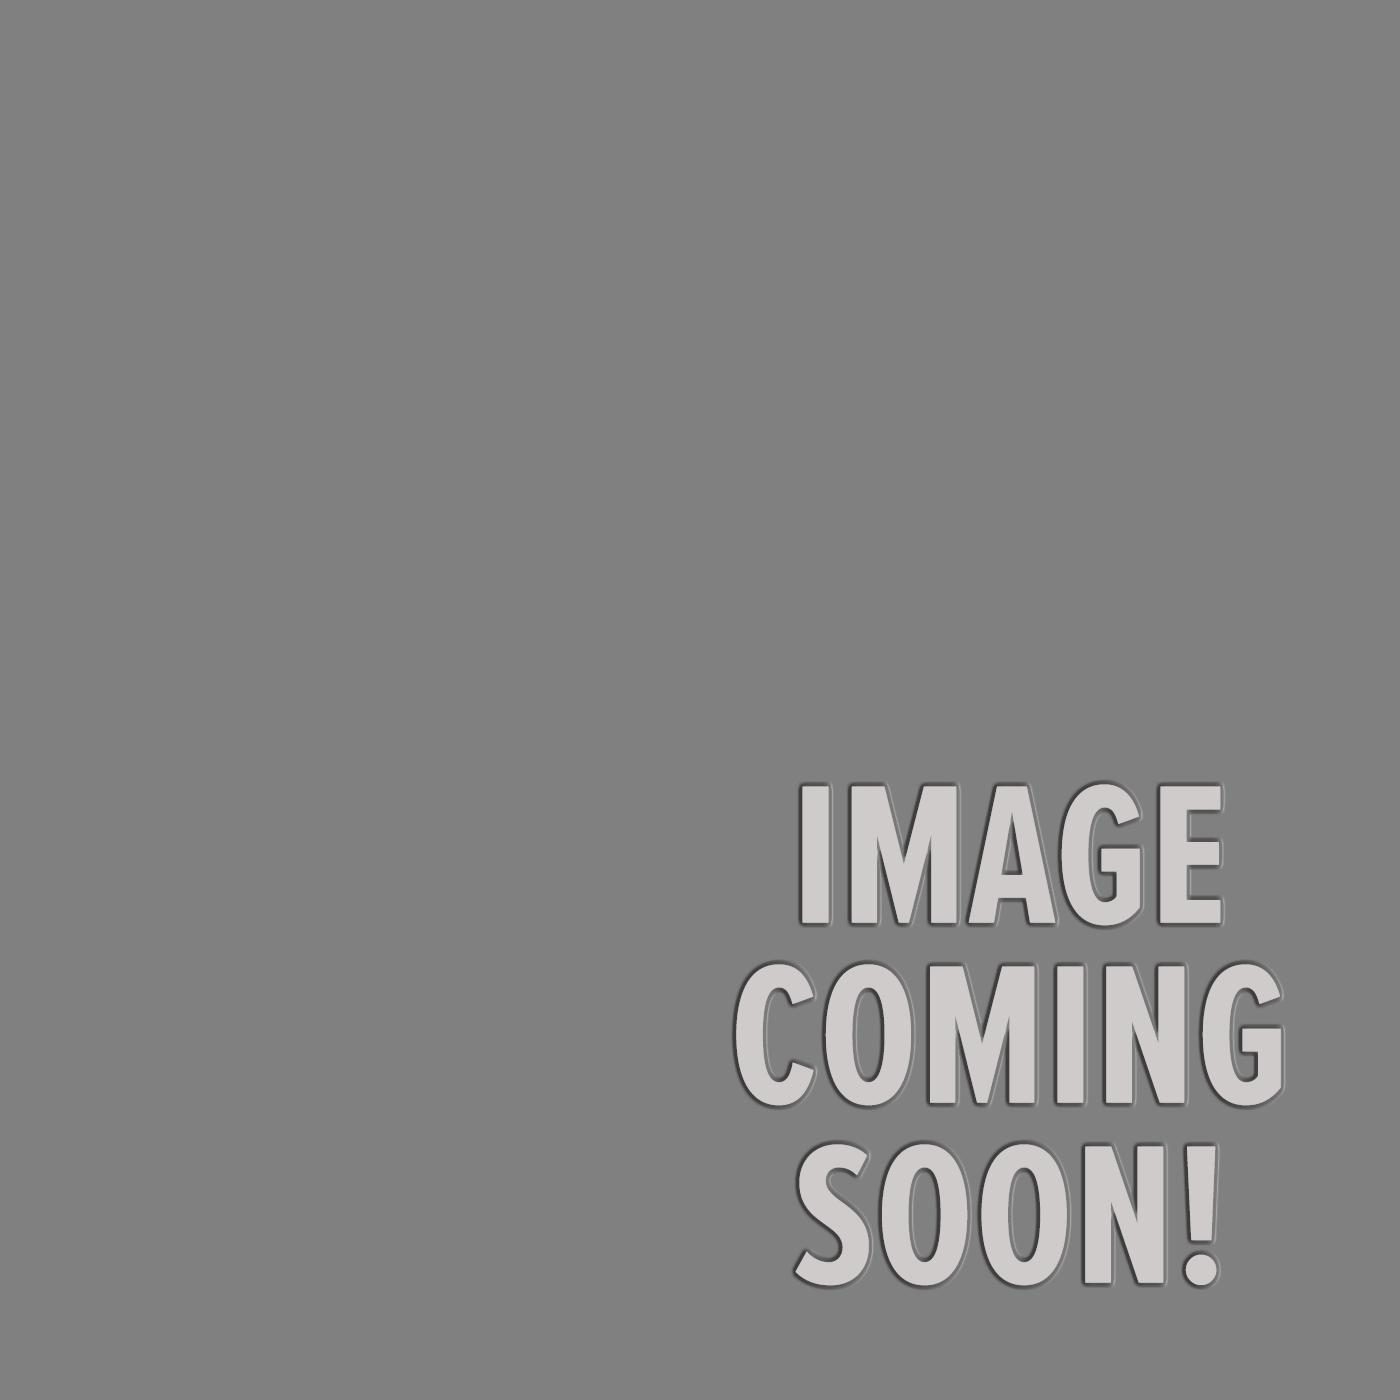 Fender American Acoustasonic Stratocaster Acoustic-Electric Guitar Transparent Sonic Blue